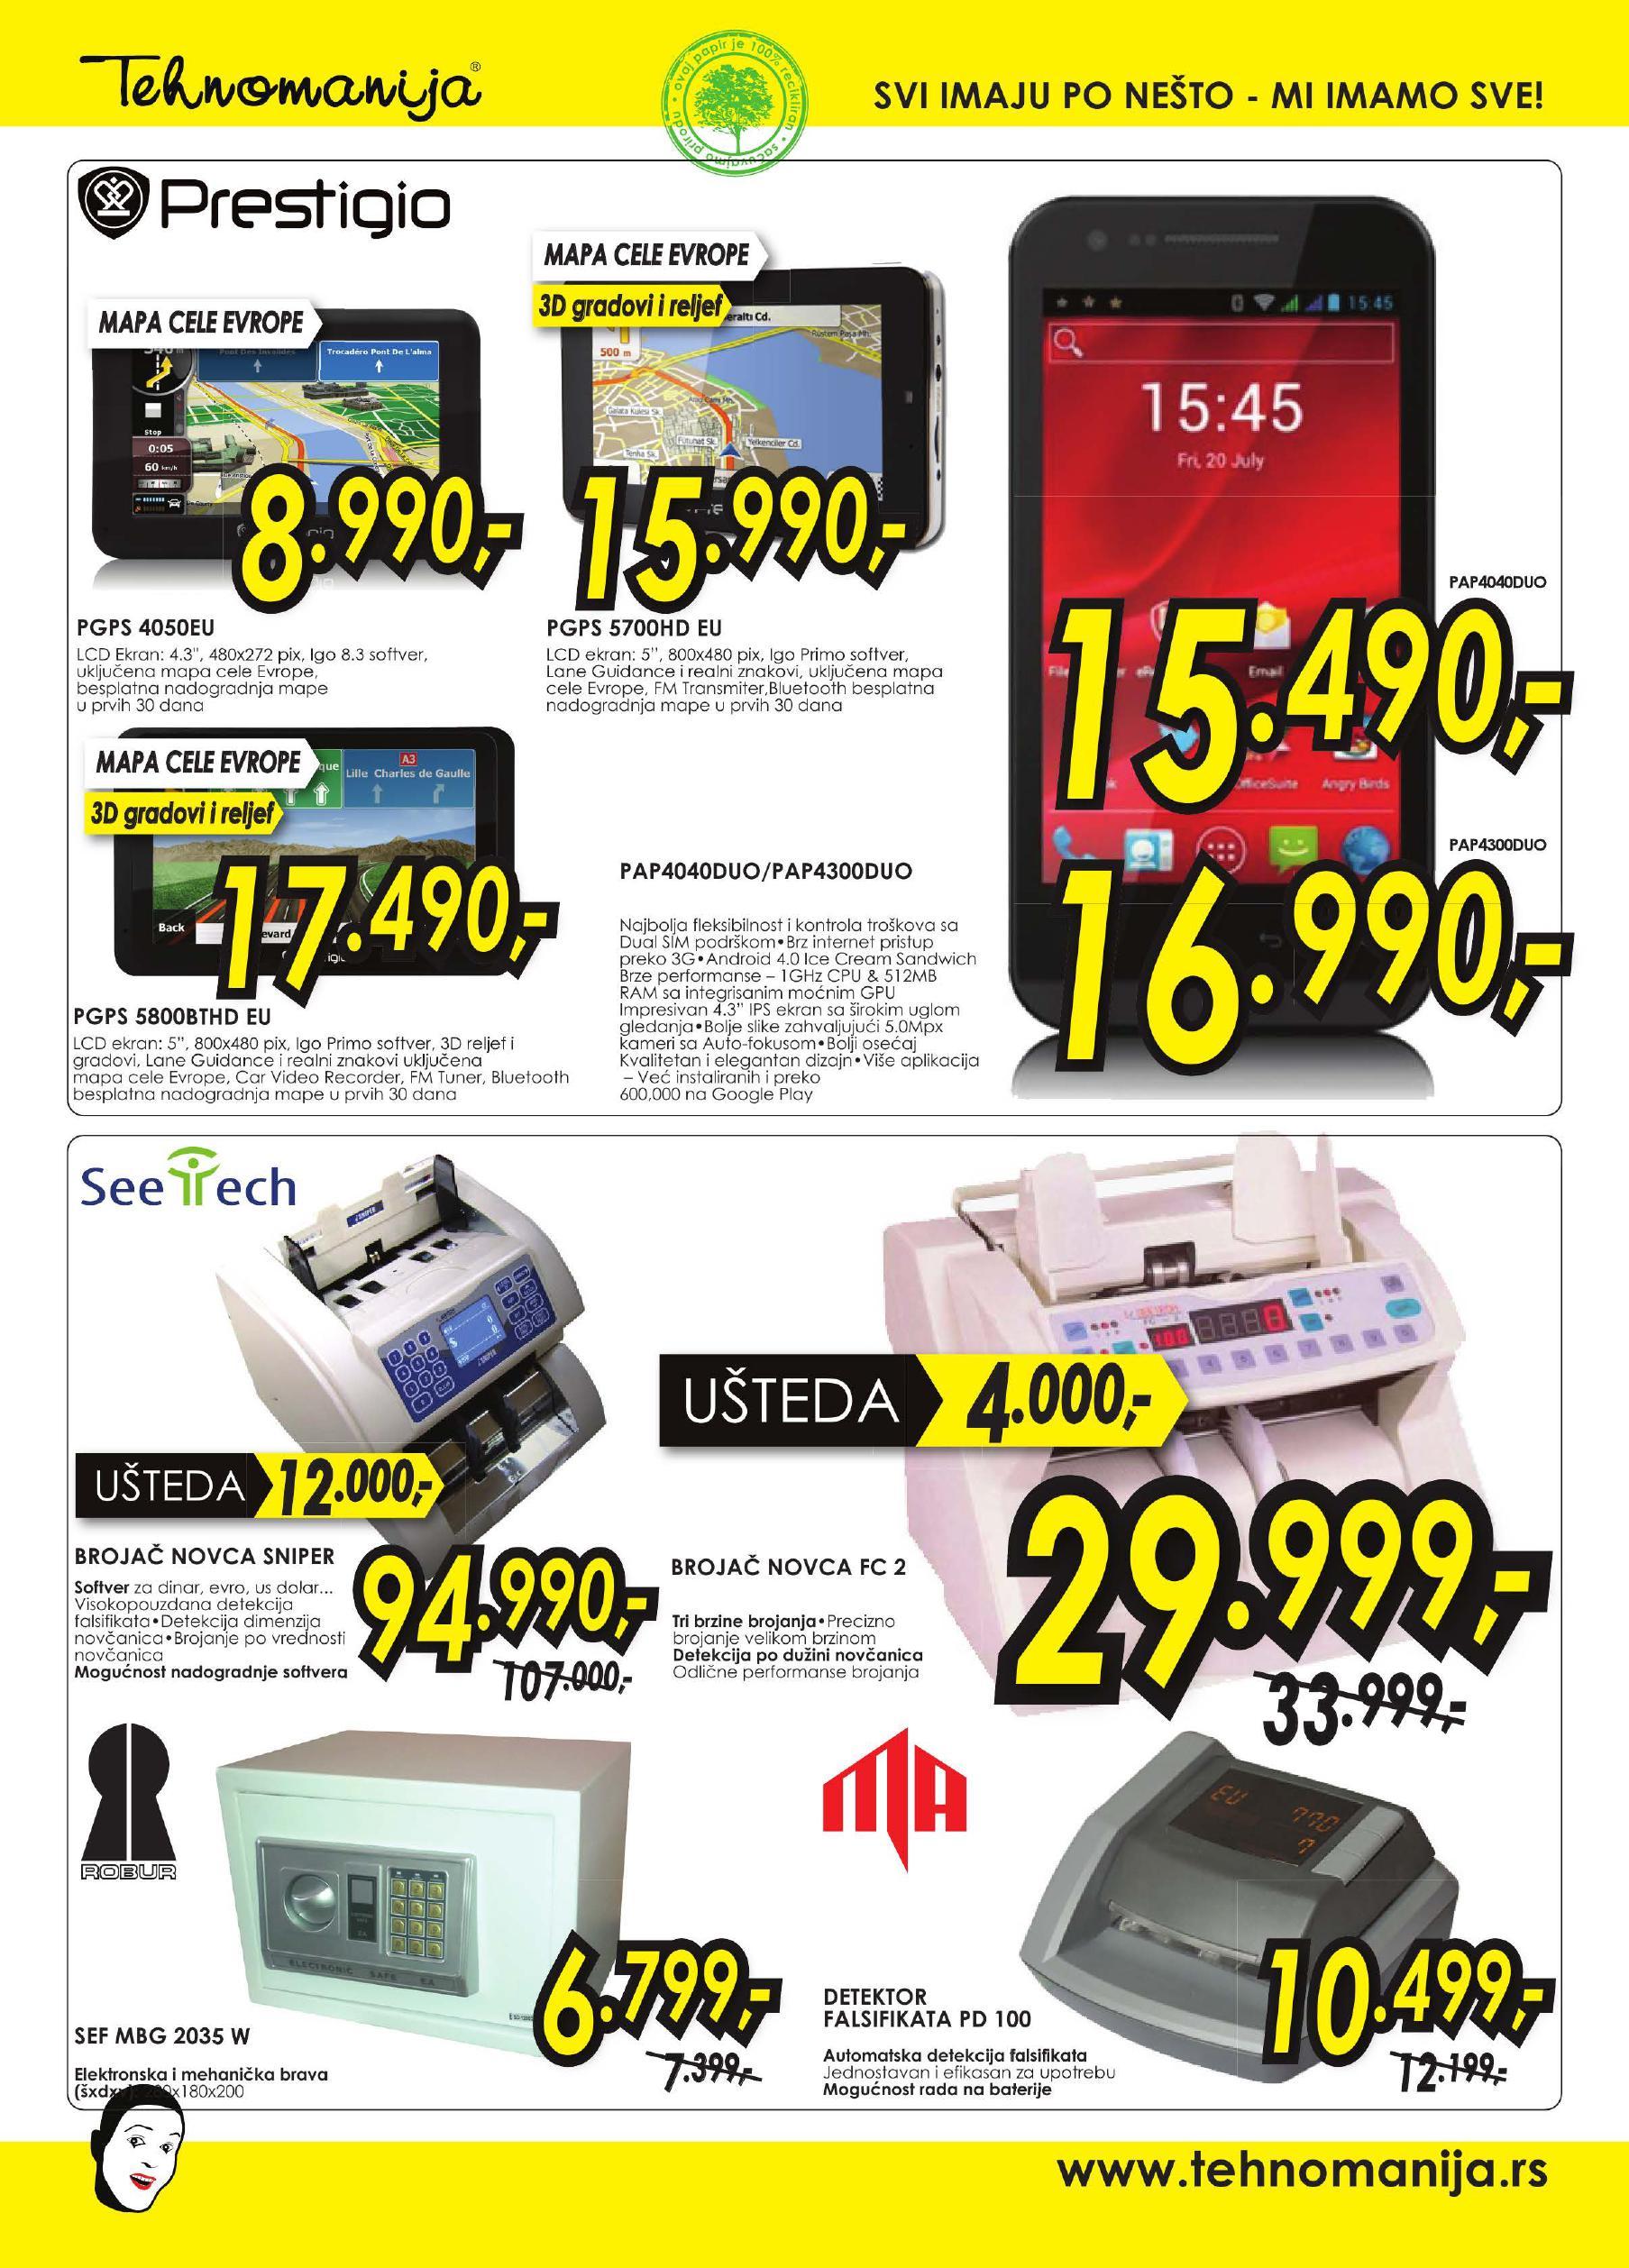 Tehnomanija katalog TV, A/V, Telefoni po super cenama